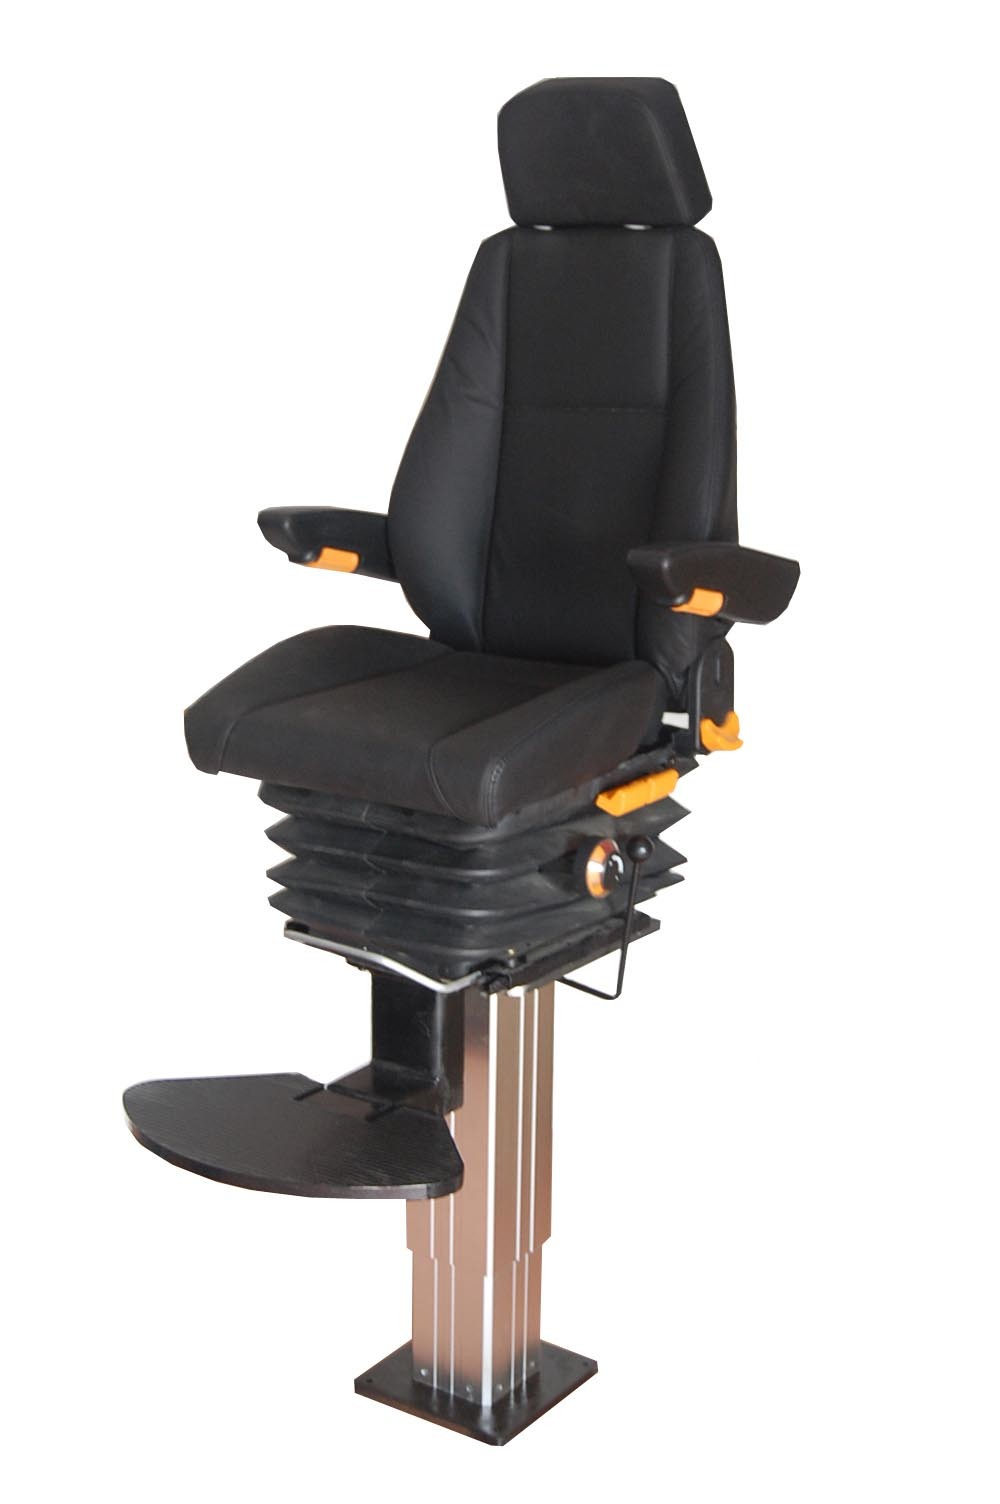 Marine Helmsman Chair/Seat